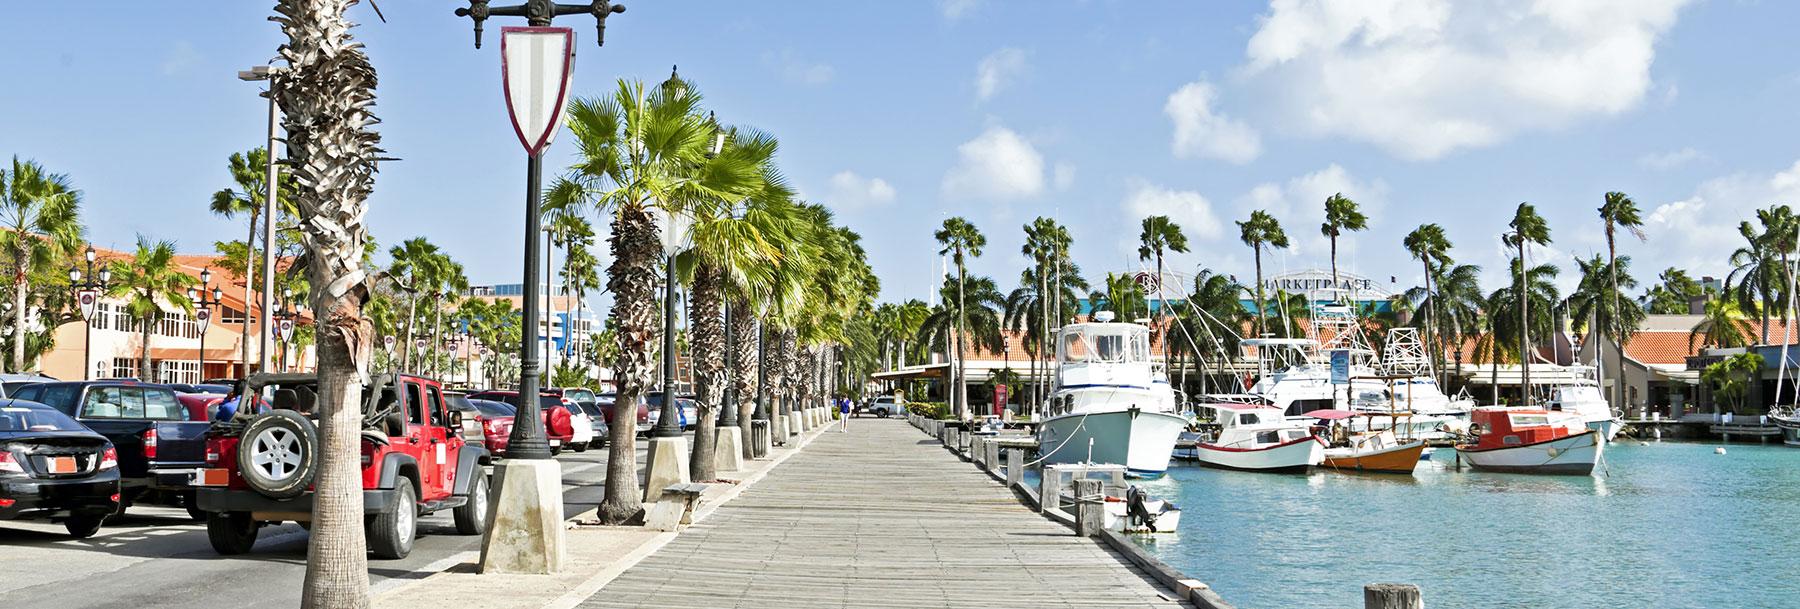 26 Tumblr Caribbean Cruise Aruba Youmailr Com